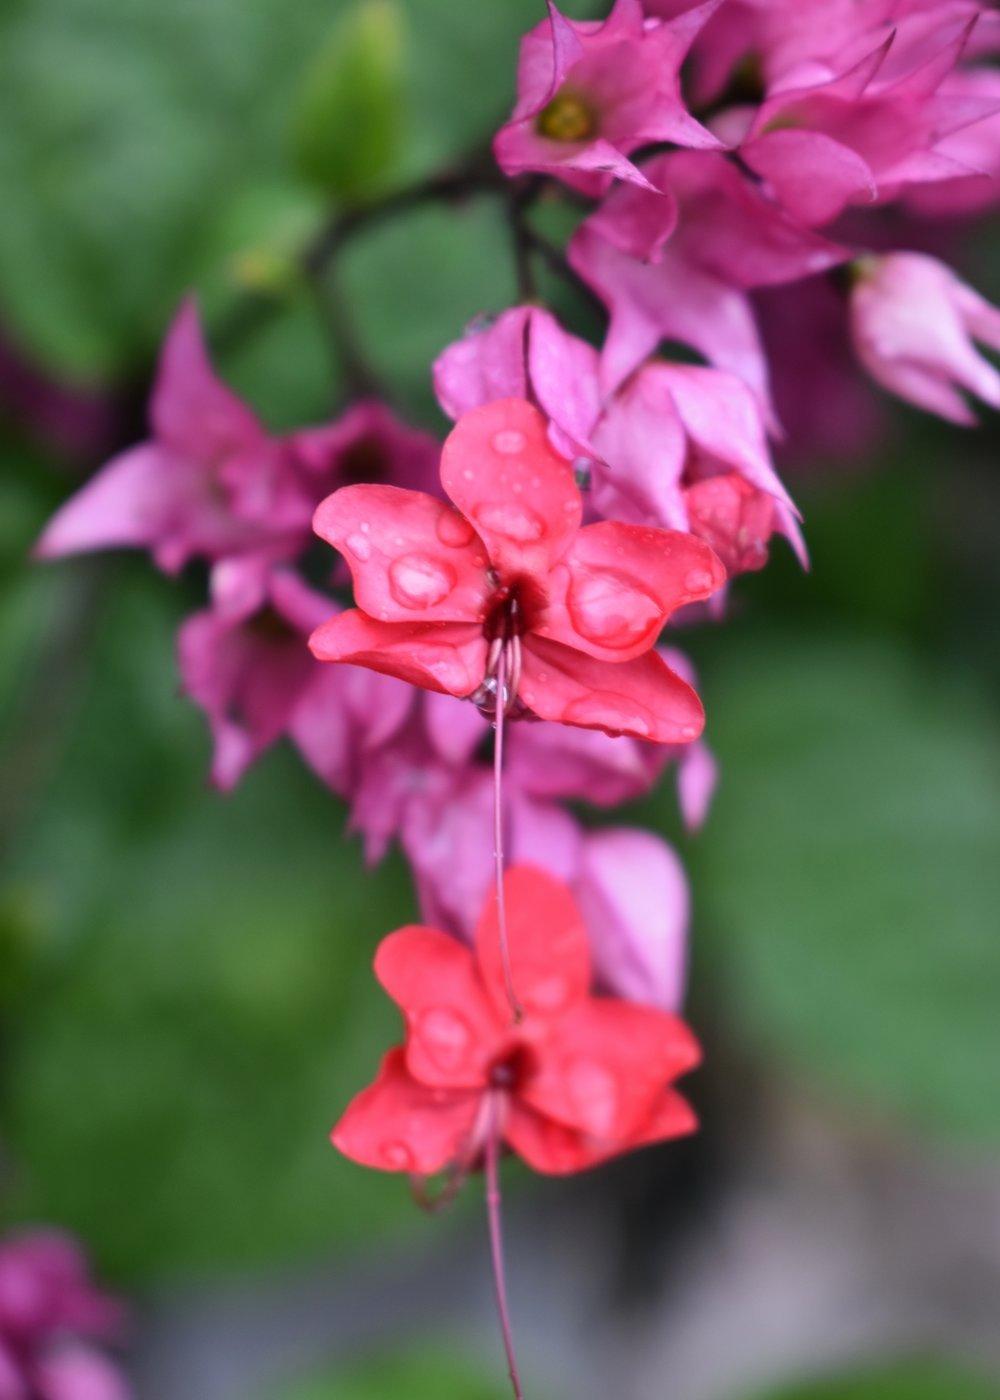 photography-basics-nature-britton-saba-flower.jpg